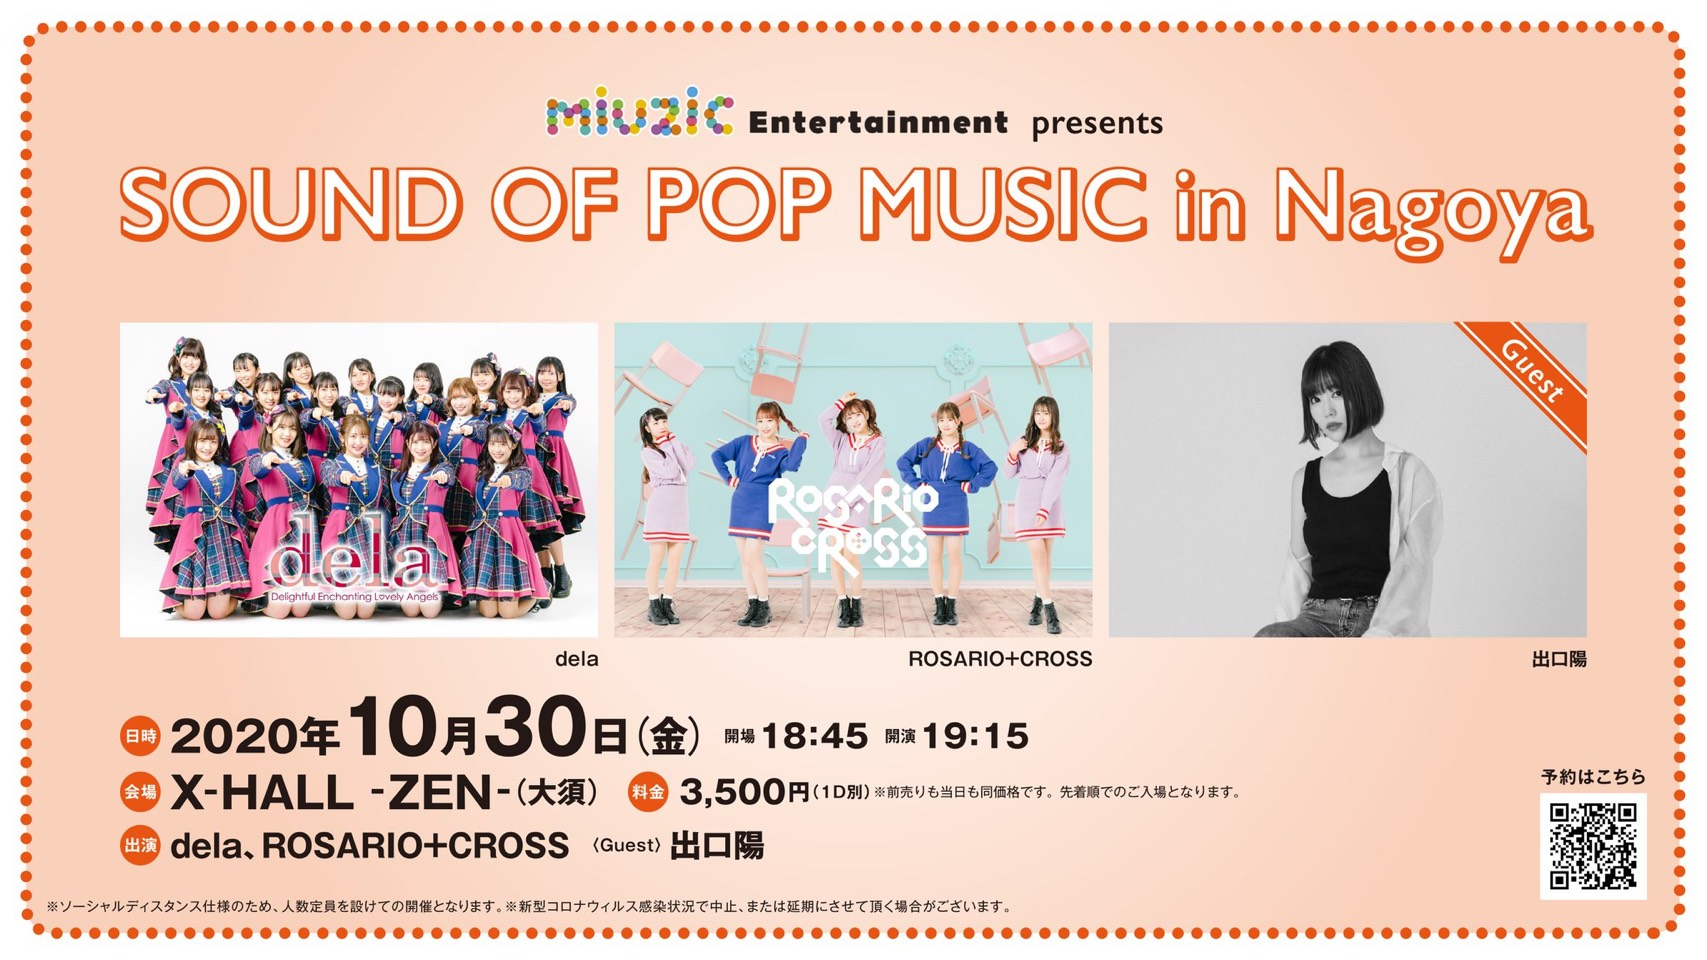 miuzic Entertainment presents 「SOUND OF POP MUSIC in Nagoya」